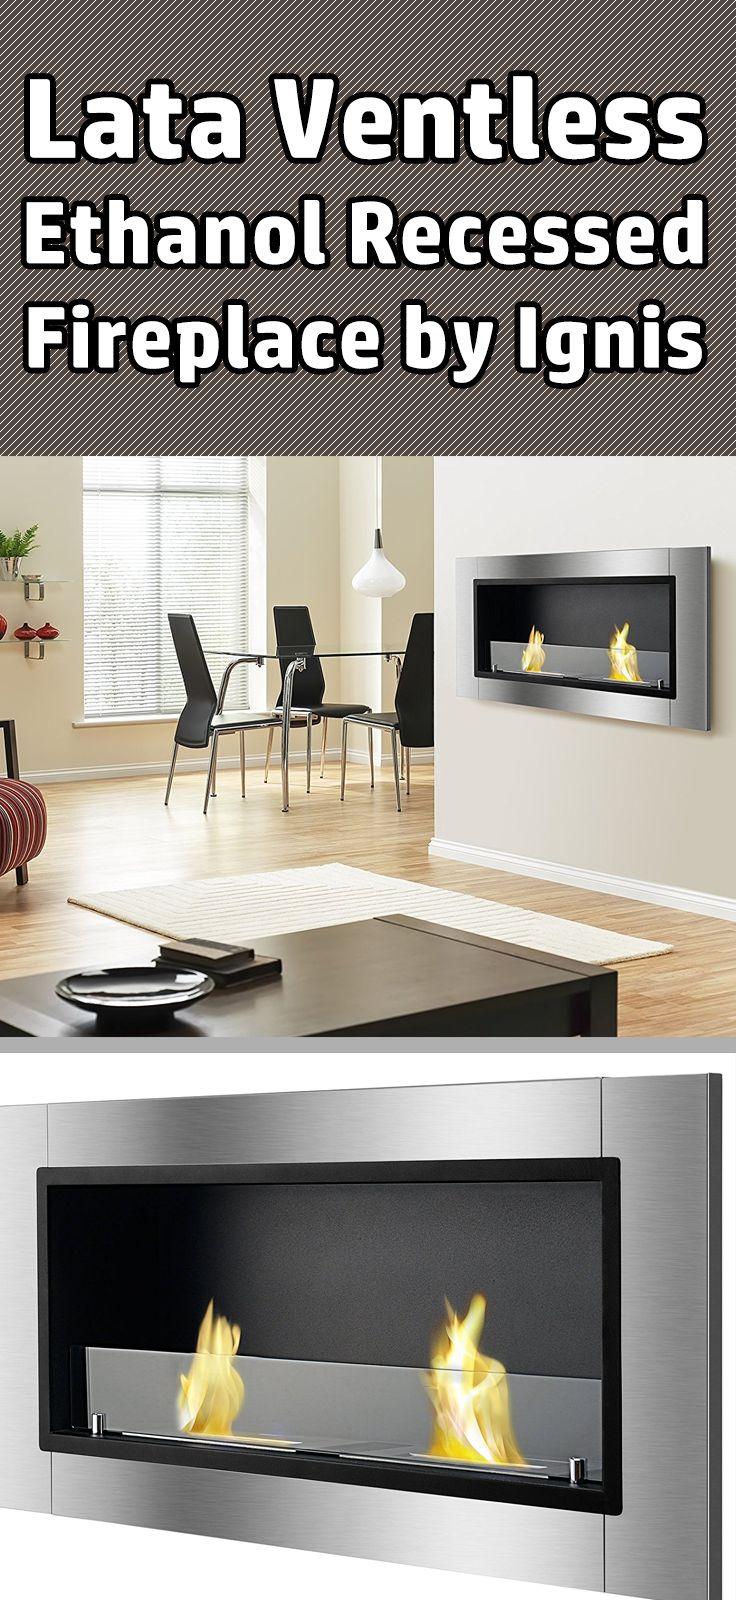 mejores 9 imágenes de ventless ethanol fireplace en pinterest